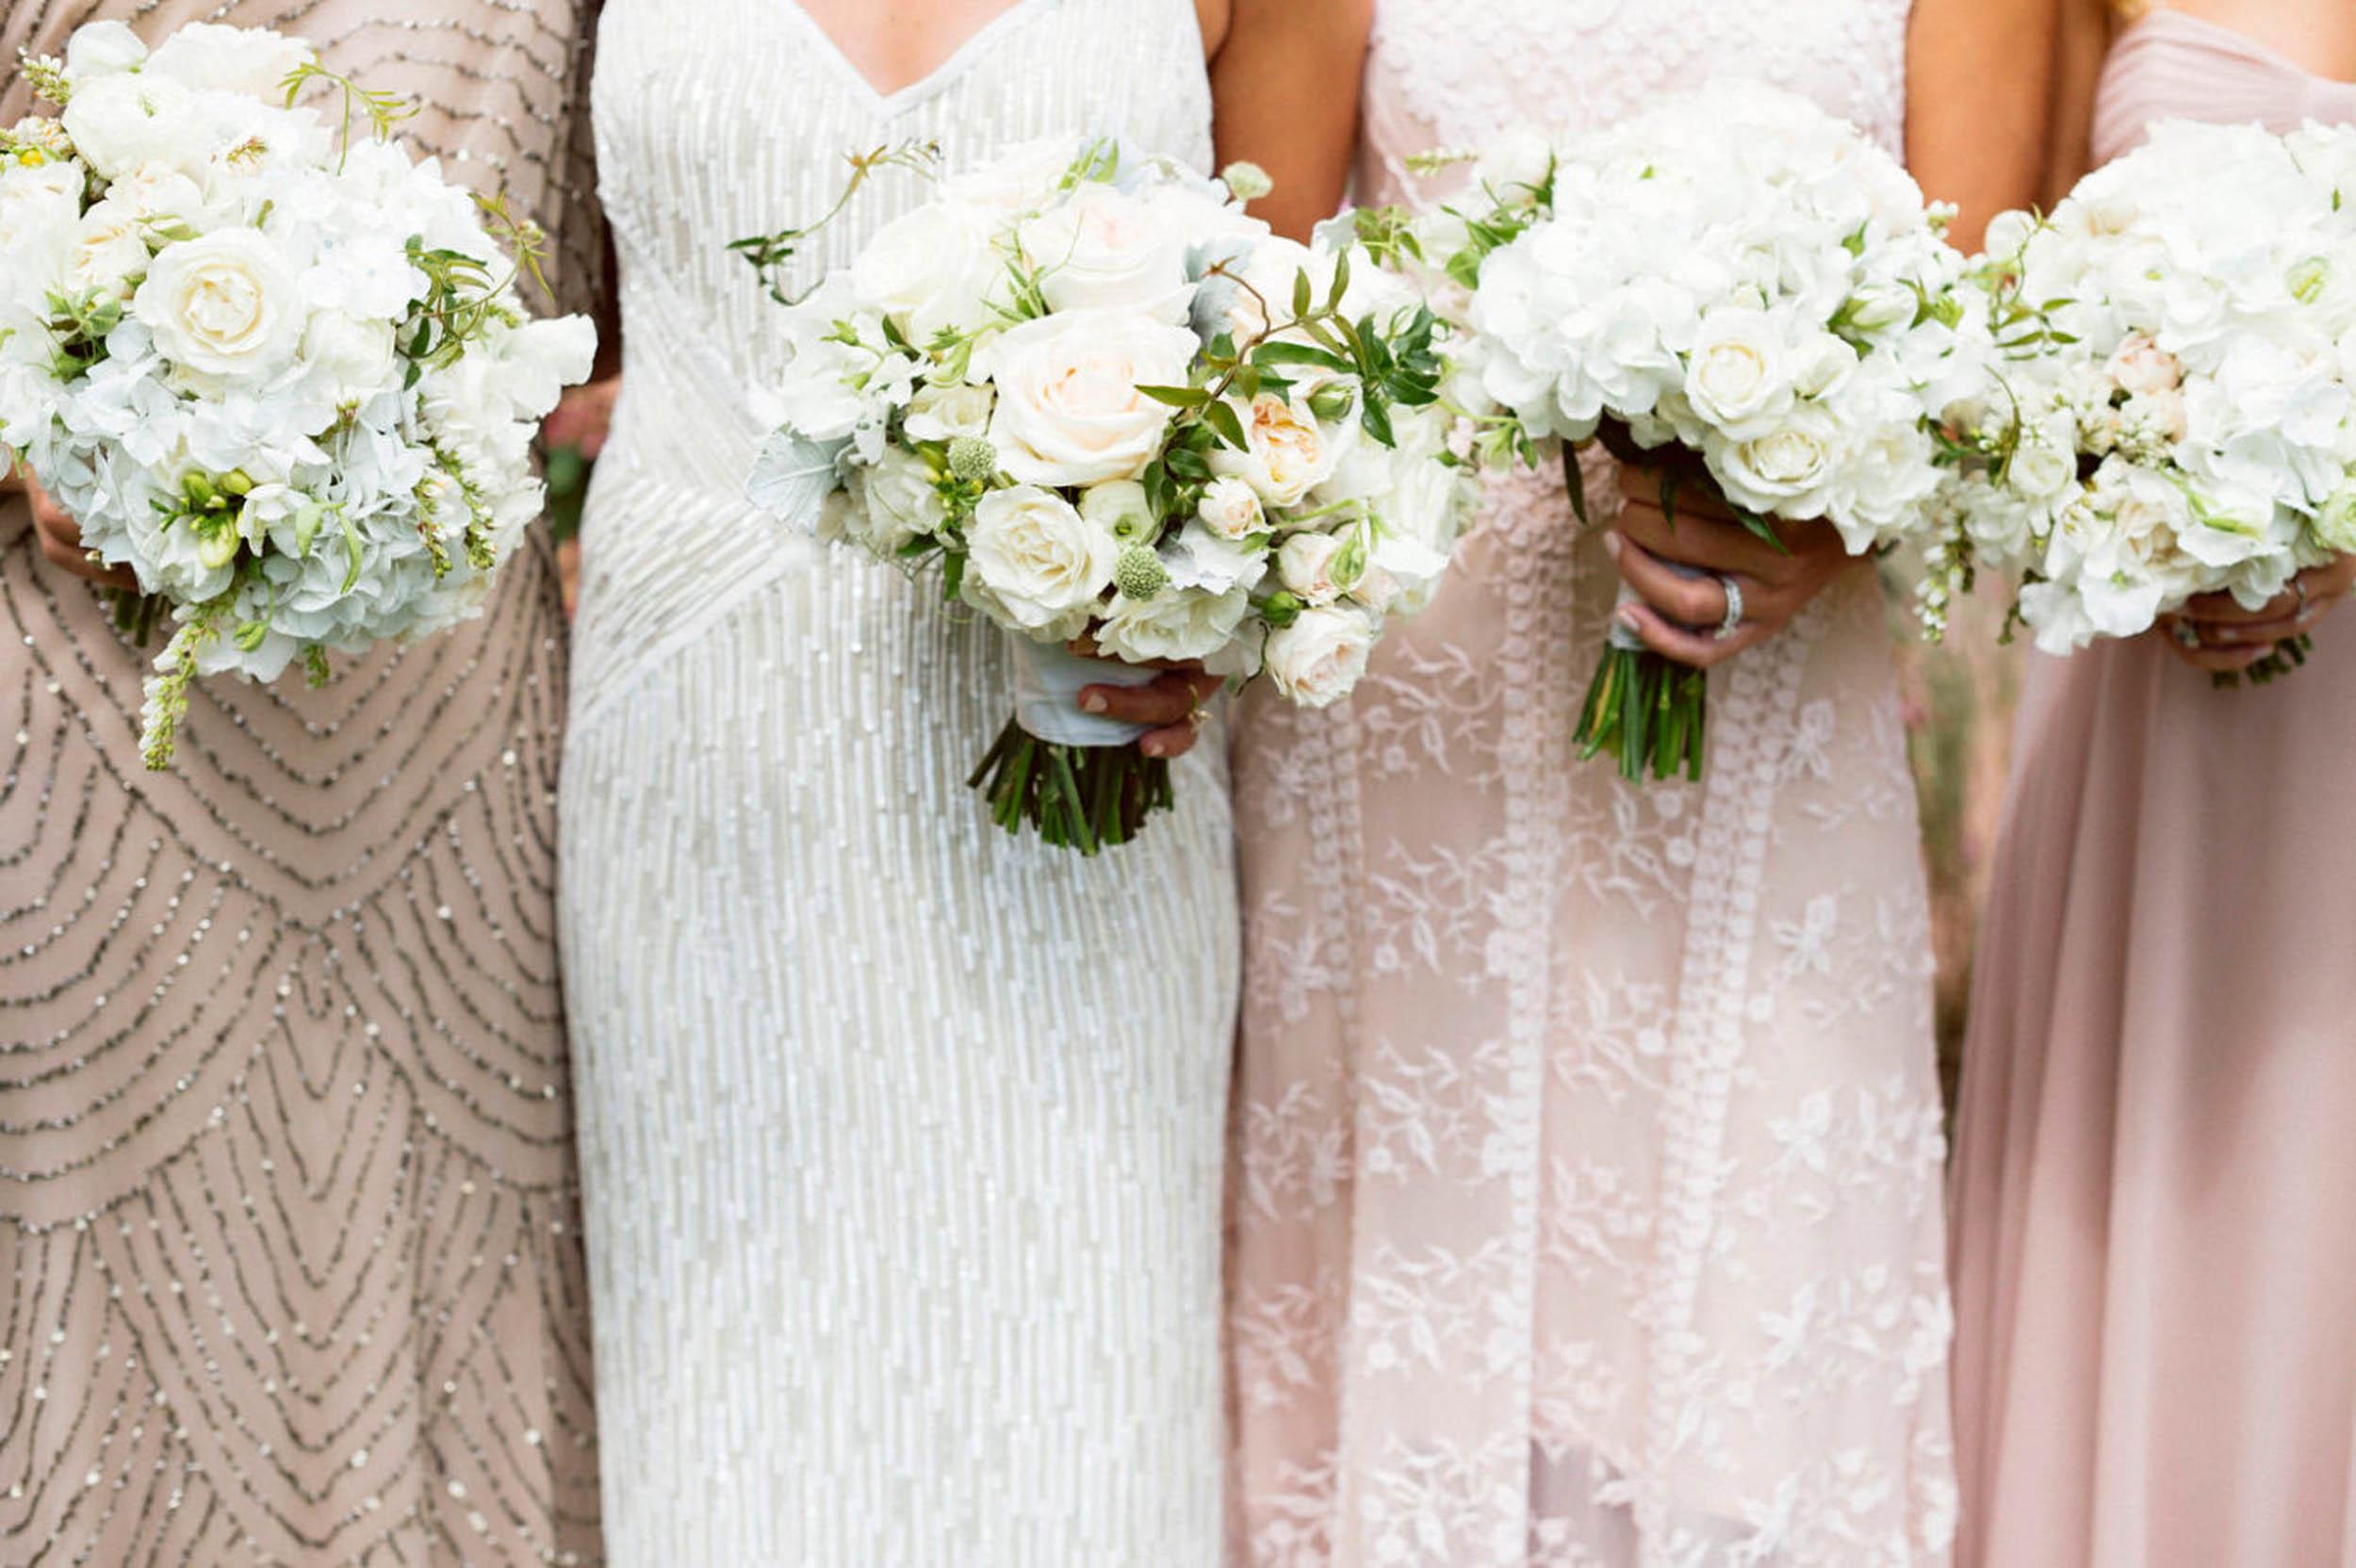 lilacs-florals-wedding-florist-bouquets-hires-019.jpg